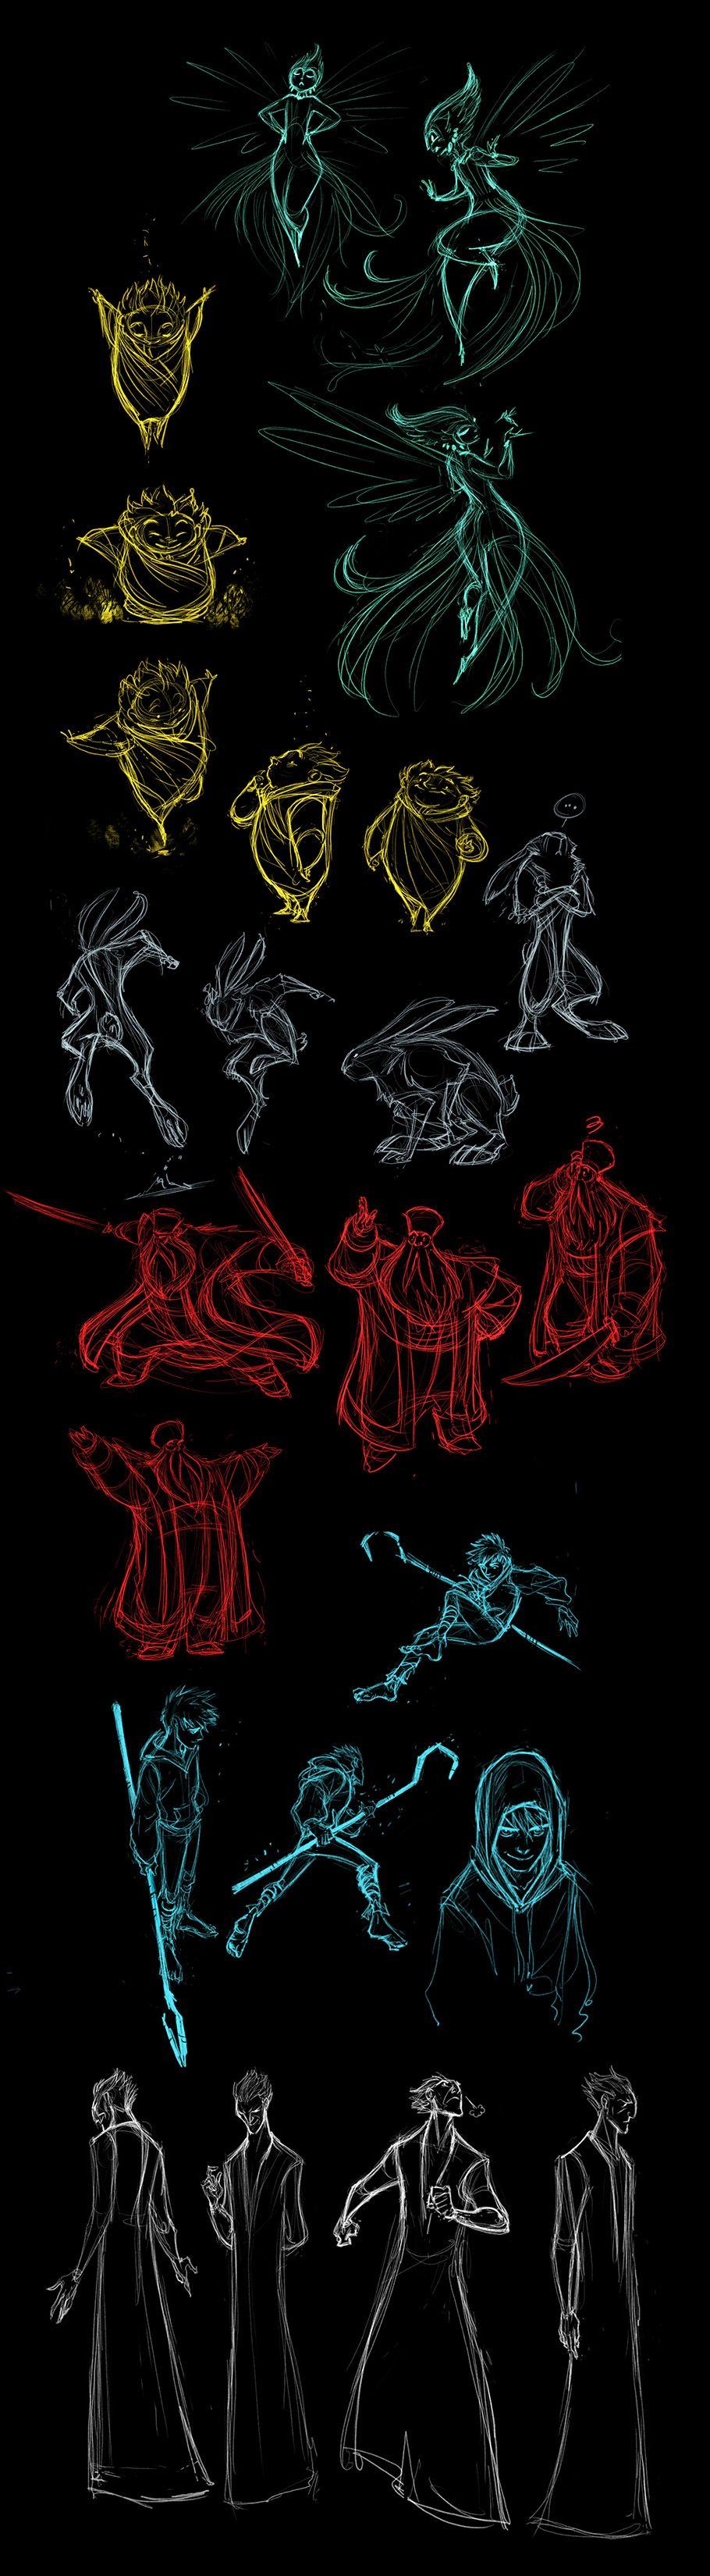 Guardians rough sketches by rufftoon.deviantart.com